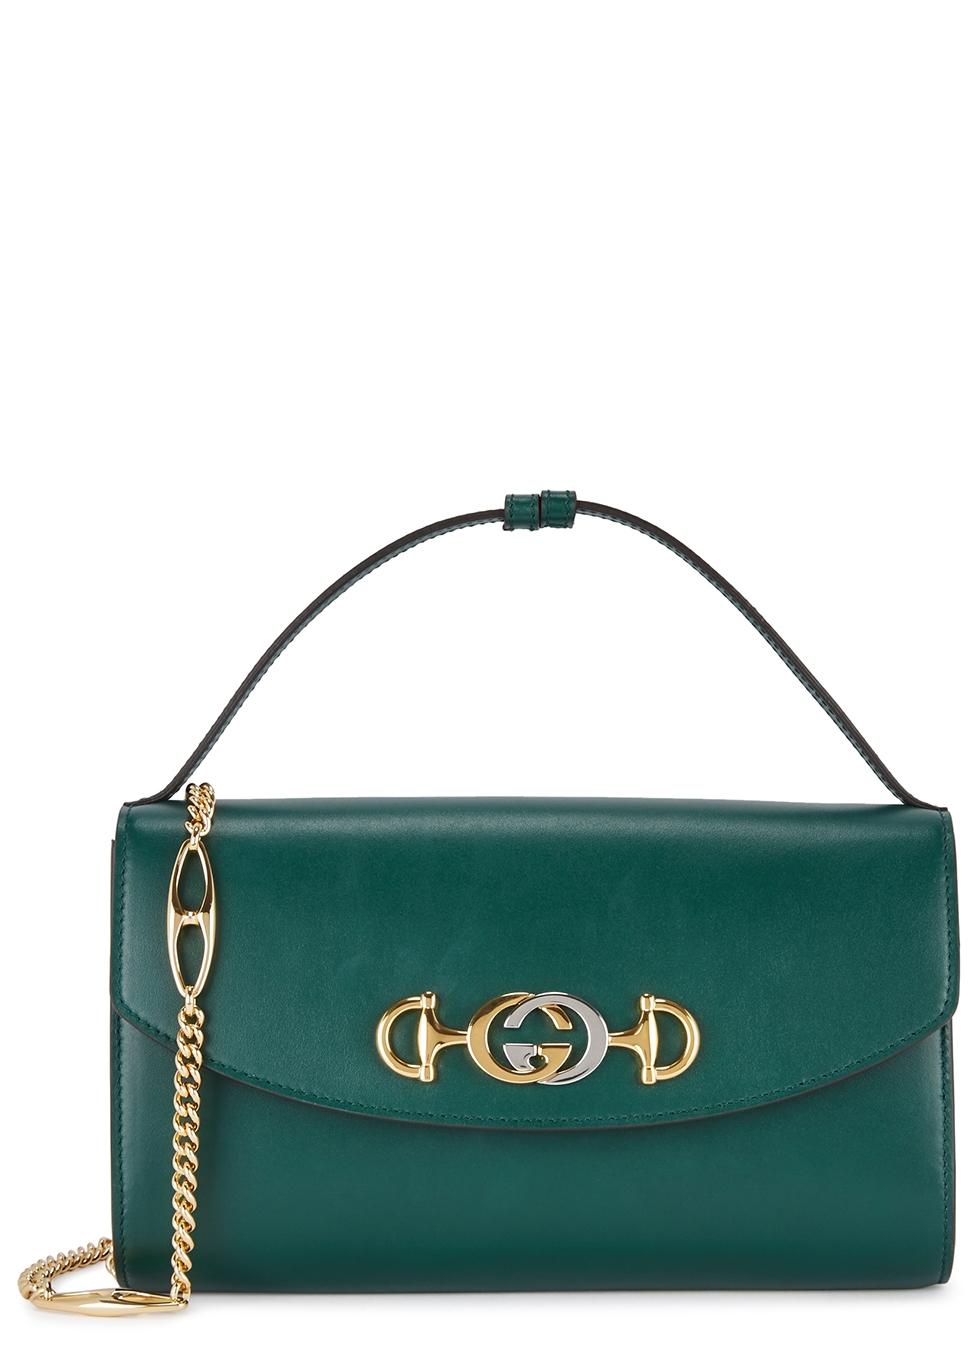 8e7daefa1cafa Gucci Zumi small leather shoulder bag - Harvey Nichols